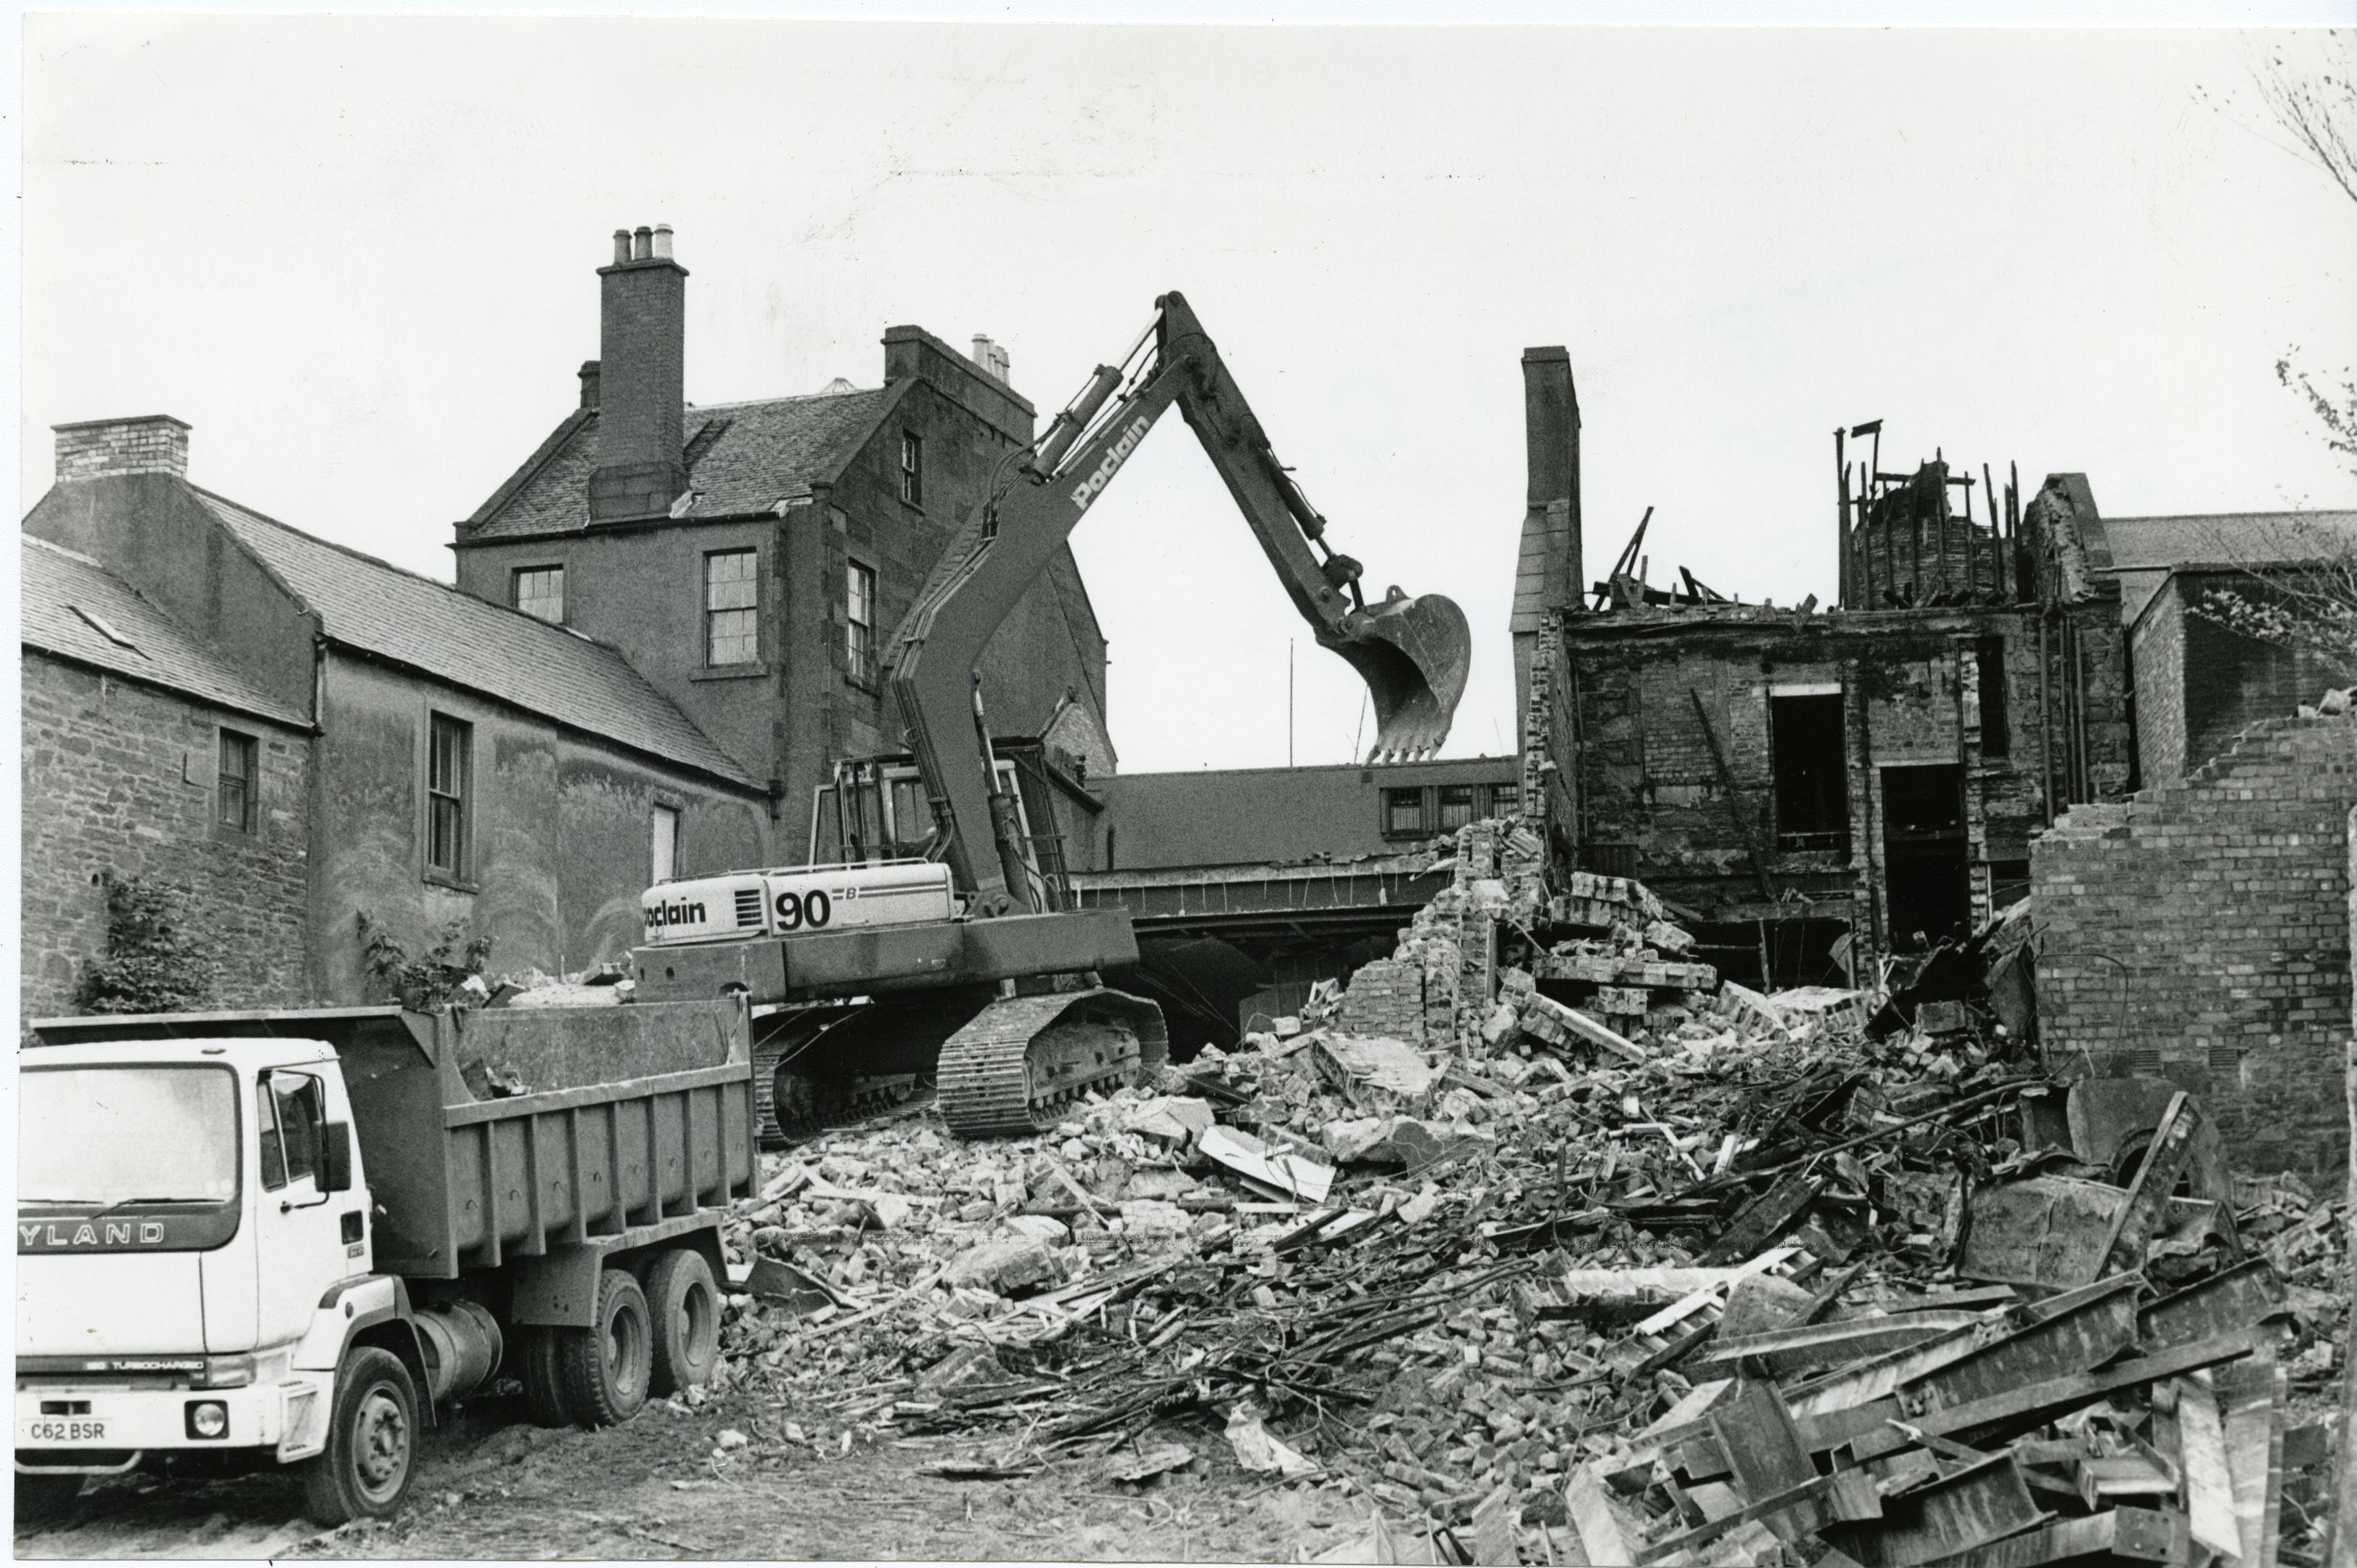 Demolition work on the Regal Cinema in Forfar